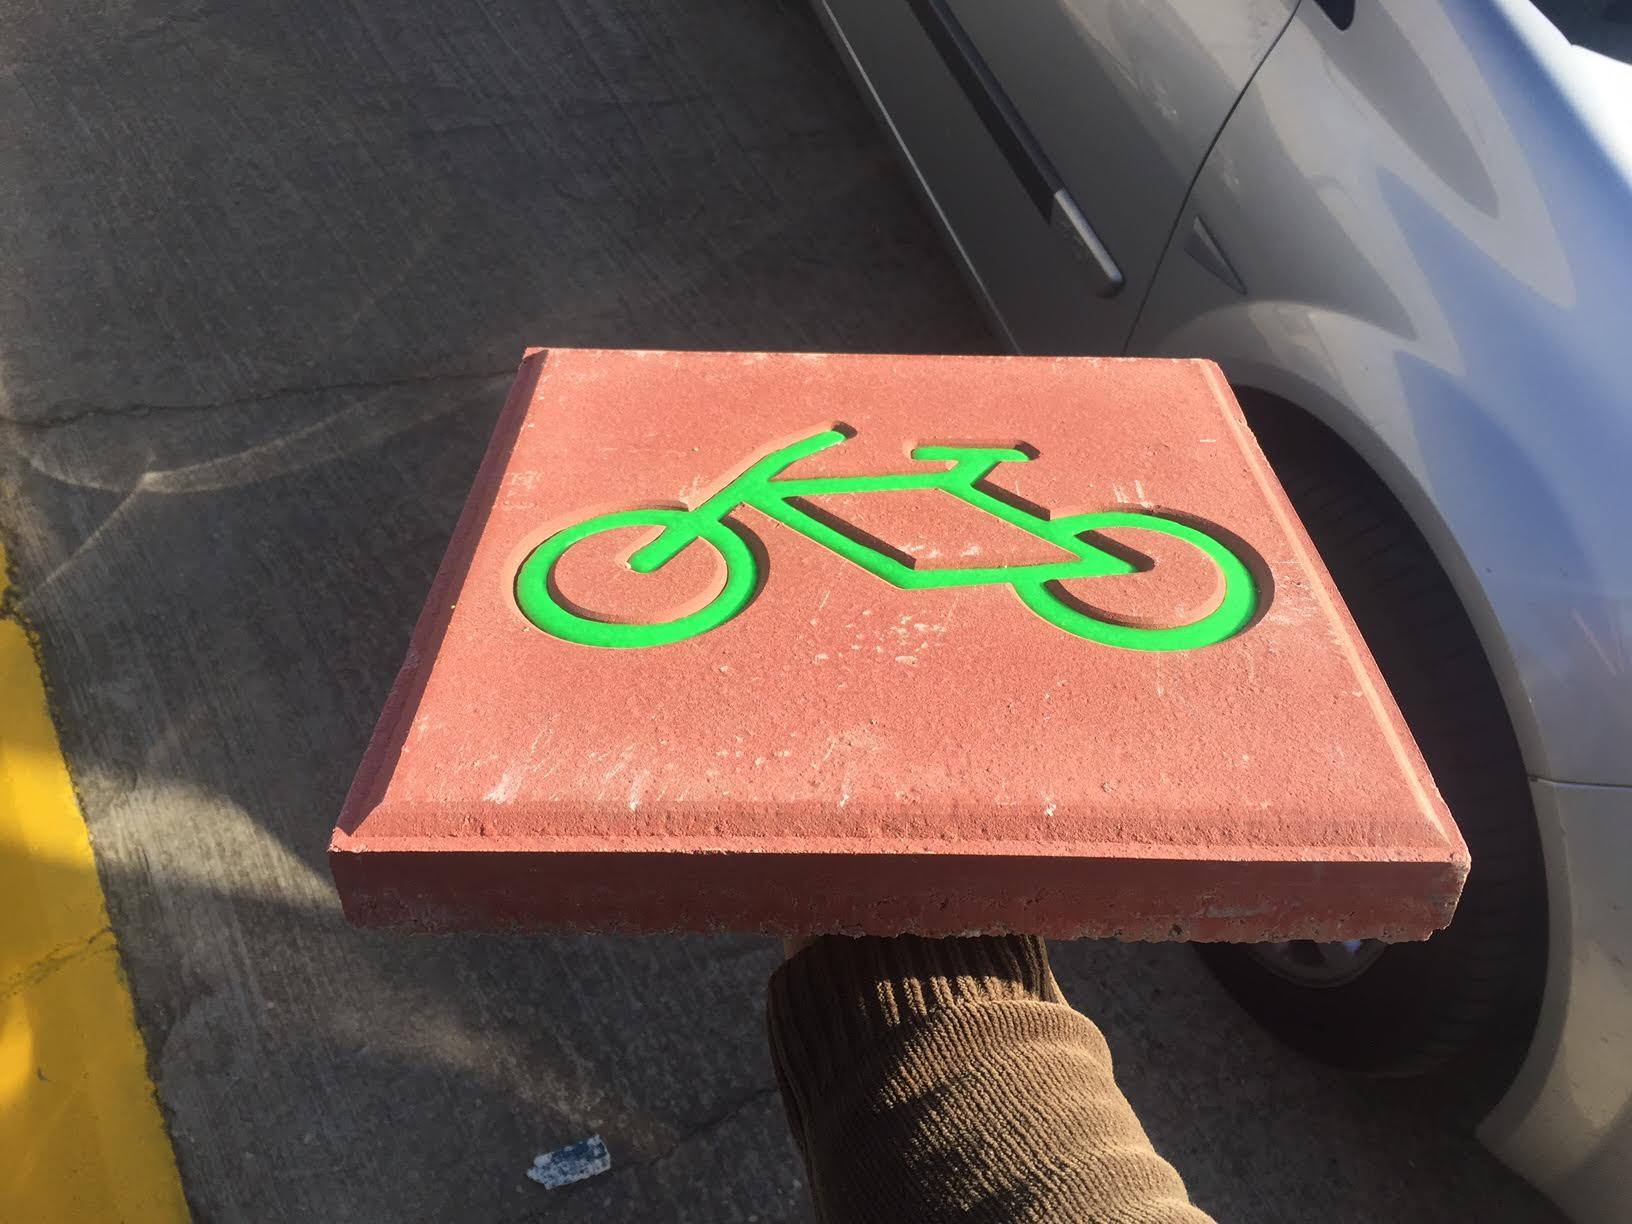 Detalle de loseta para carril bicicleta luminiscente